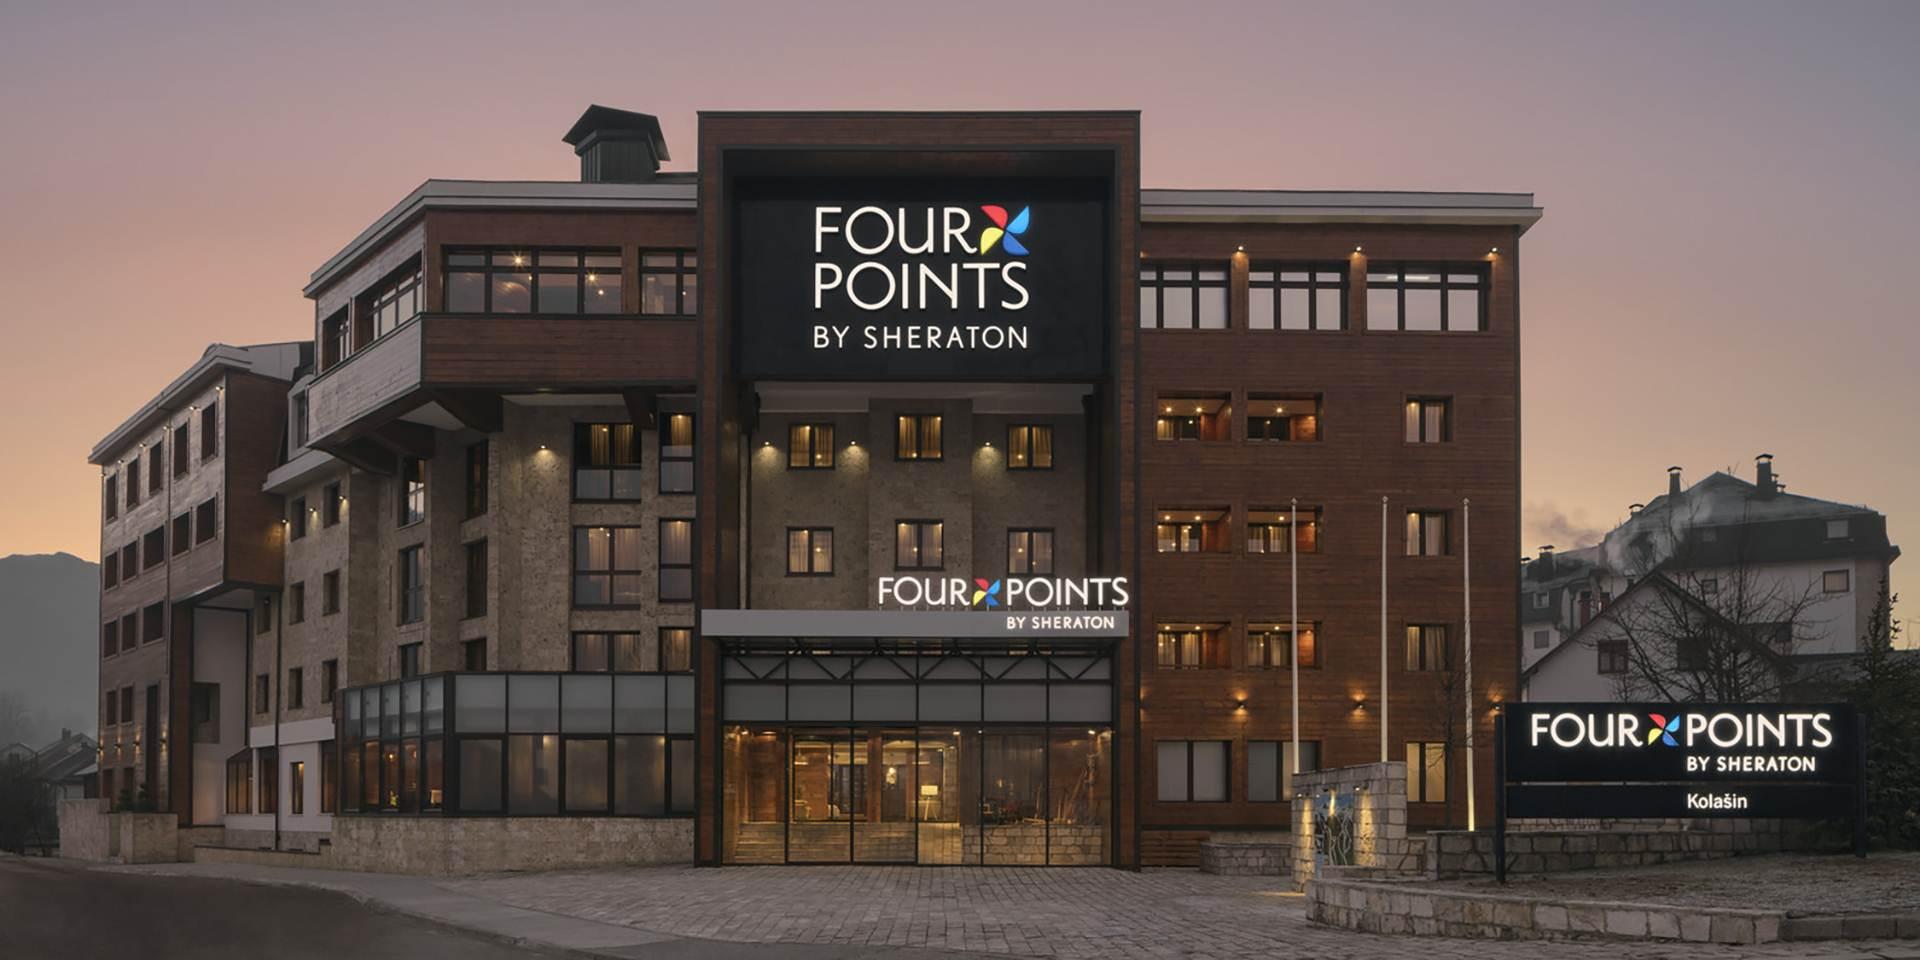 Hotel Four Points by Sheraton Kolašin em Montenegro